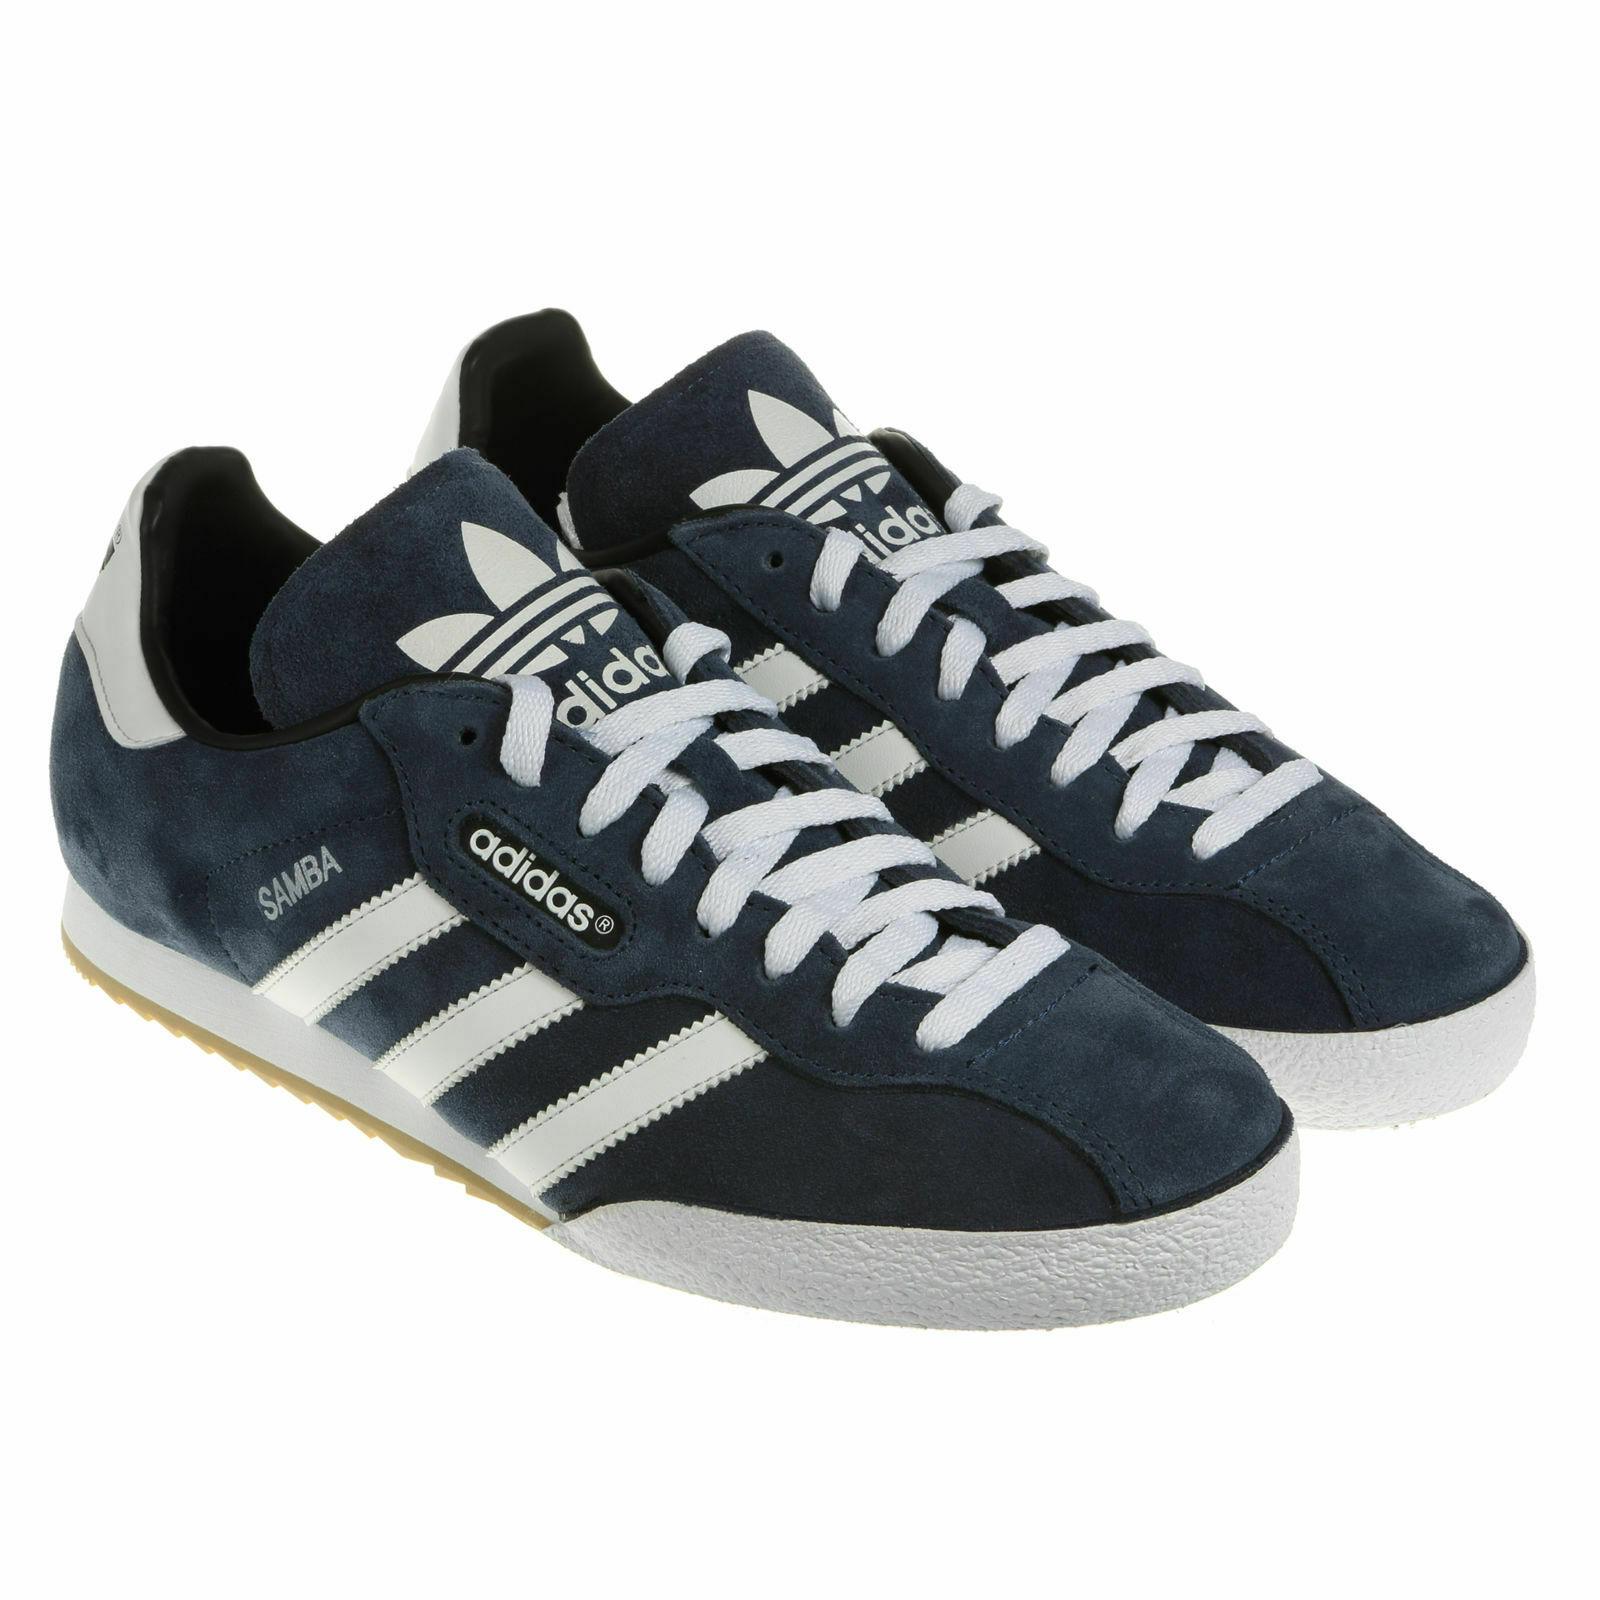 Adidas Original Samba Super Veloursleder Herren Turnschuhe Leder - Marineblau